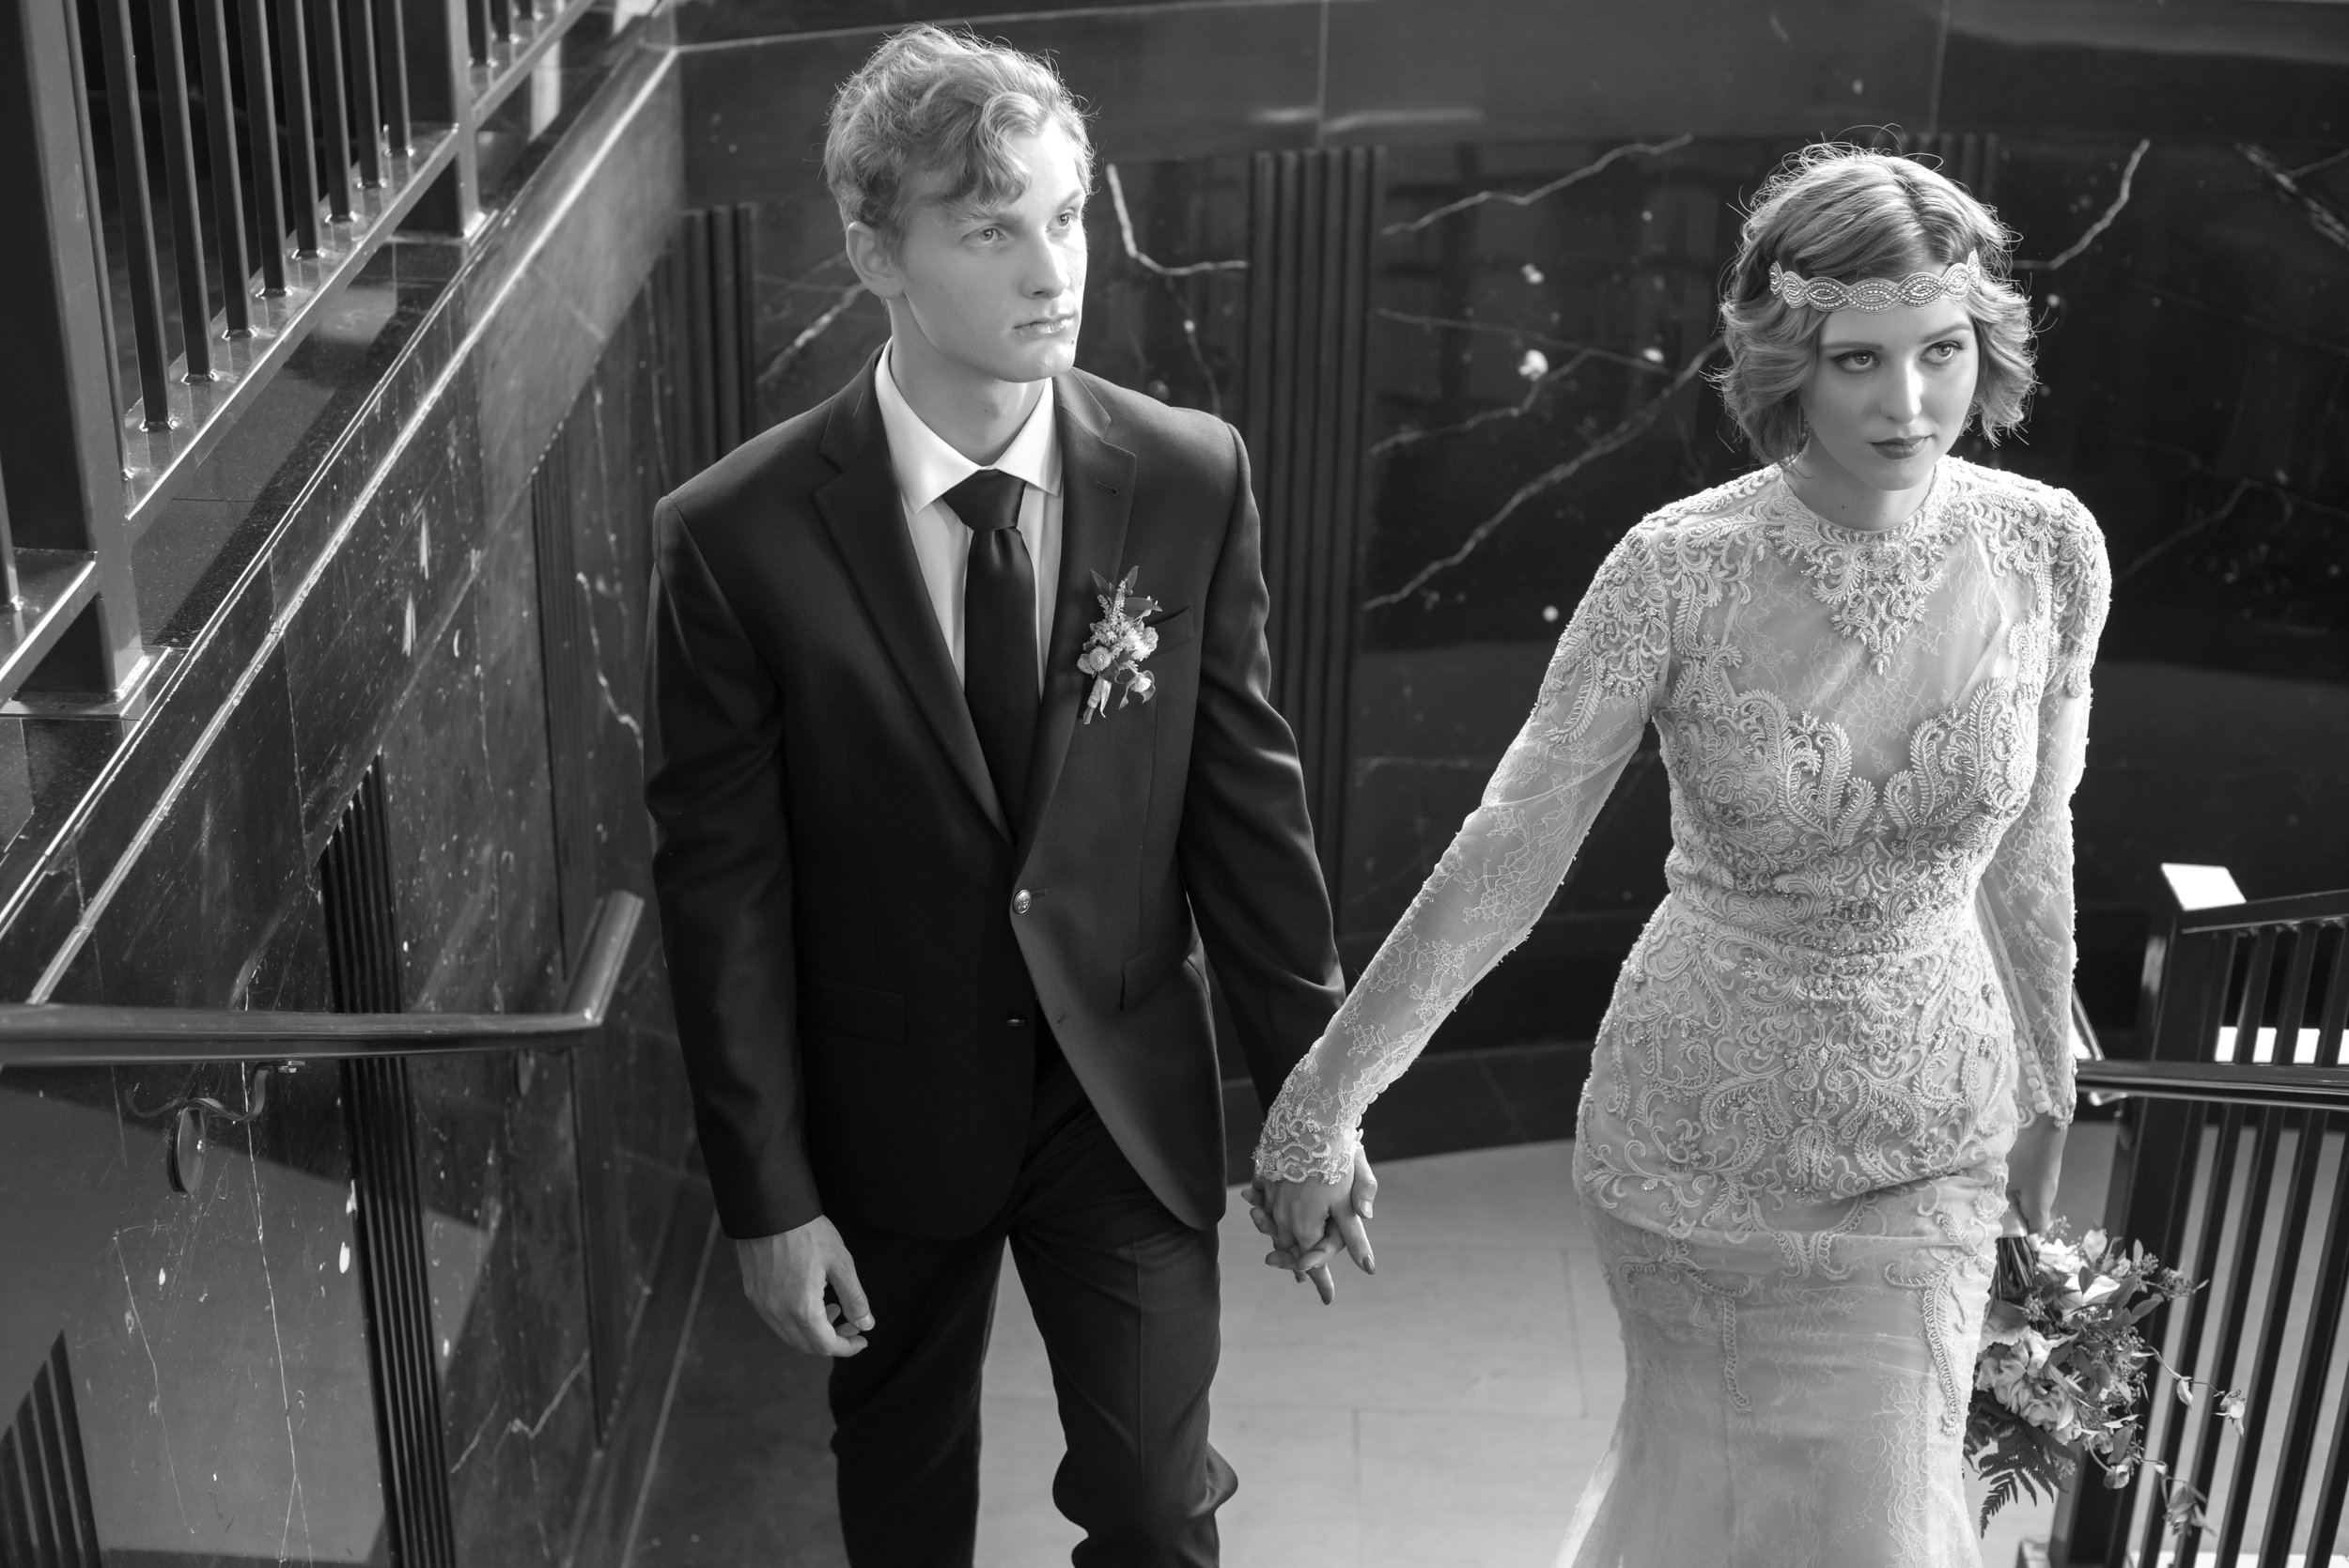 20's inspired wedding shoot at The Carlisle Room in Dallas, Texas